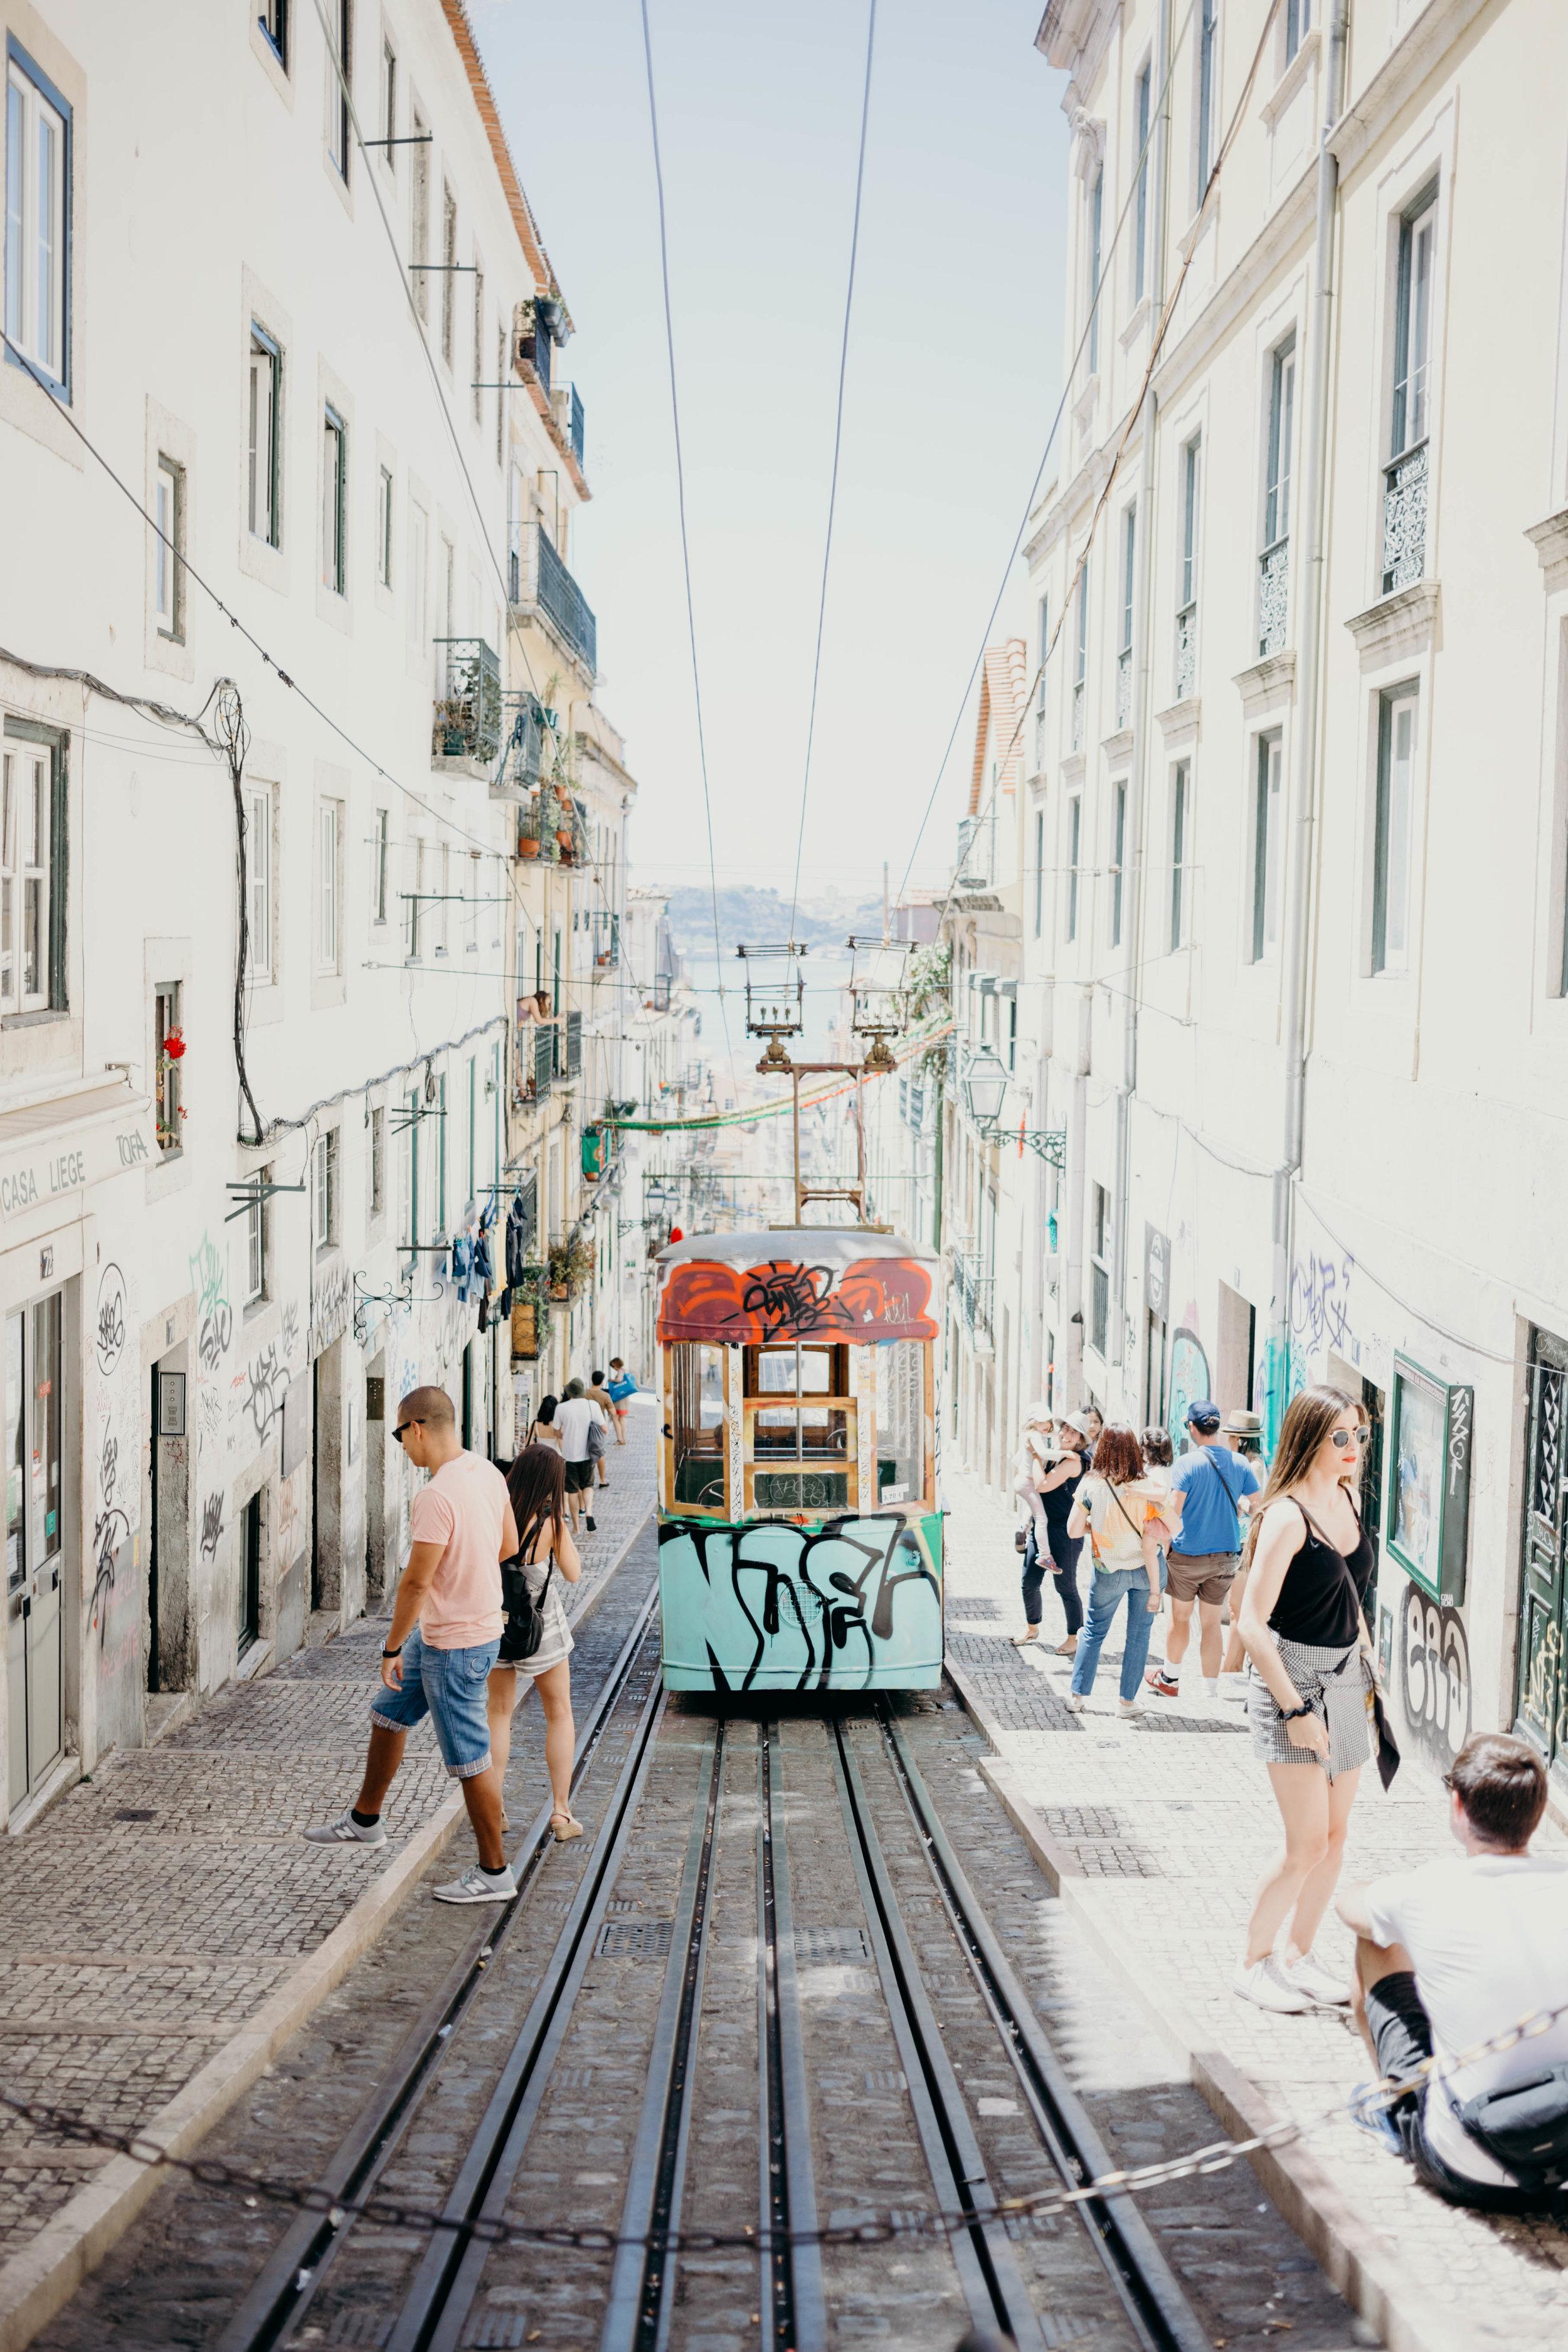 Our Portugal Travel Diary: Lisbon, Porto, and More | On the Street Where We Live (aretherelilactrees.com)  Lisbon tram, Baixa, Chiado